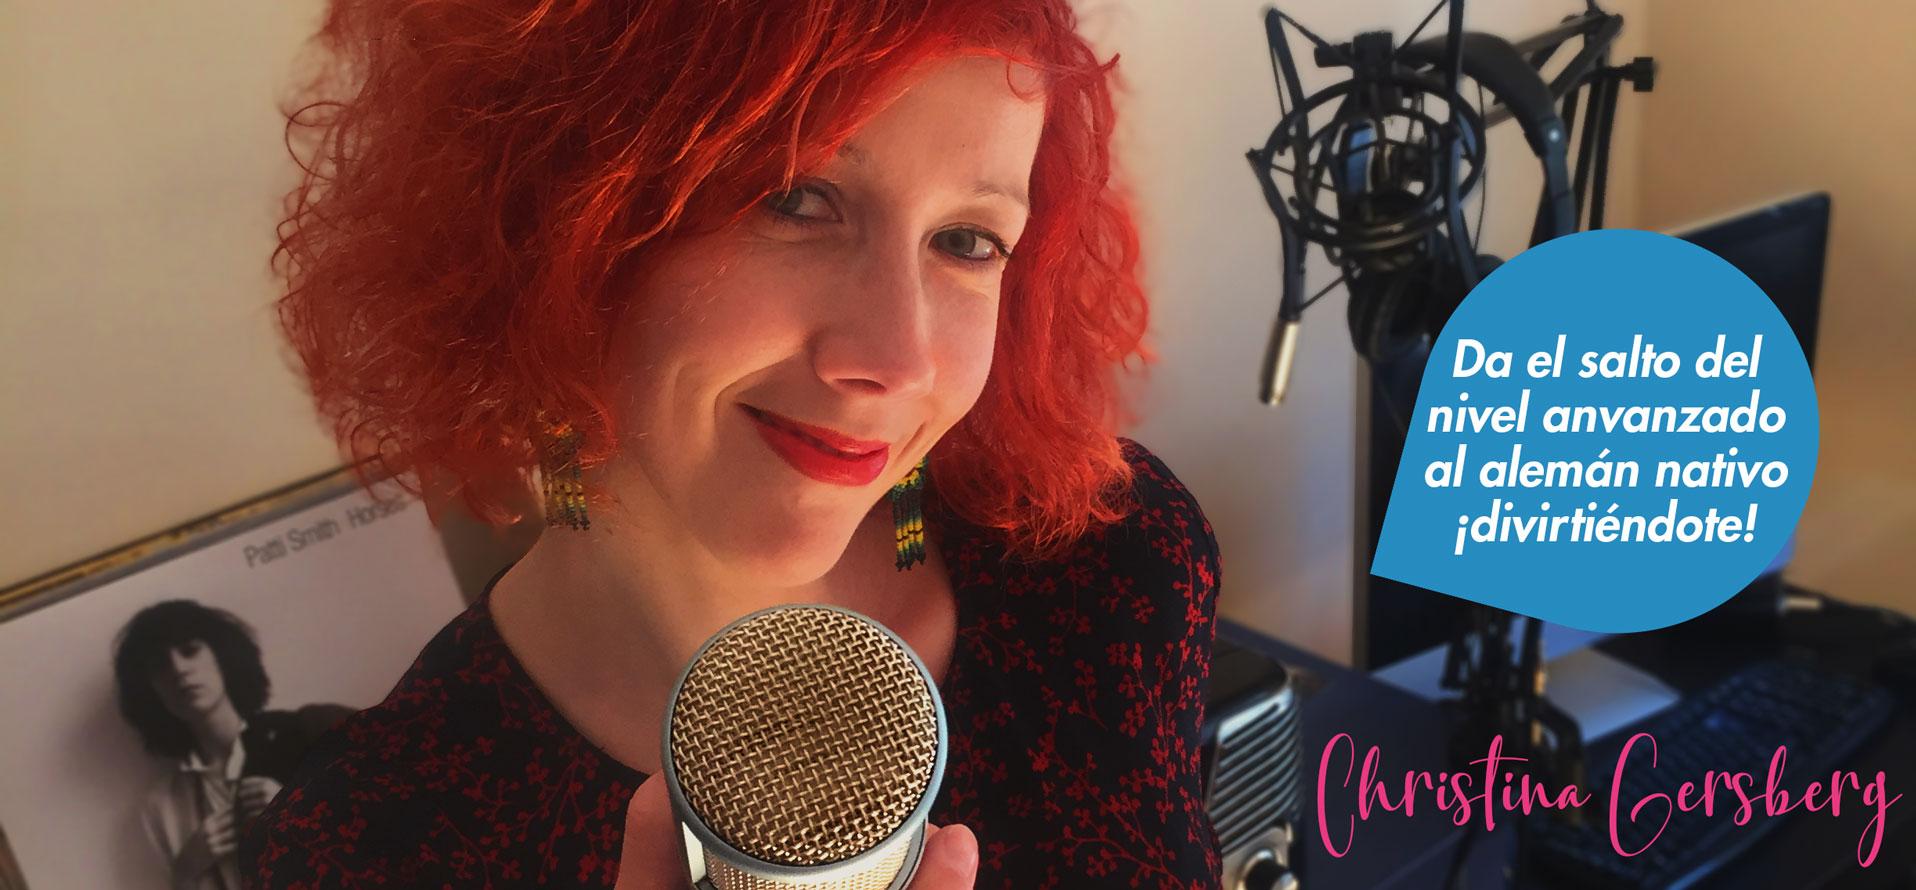 Christina Gersberg - curso de aleman online